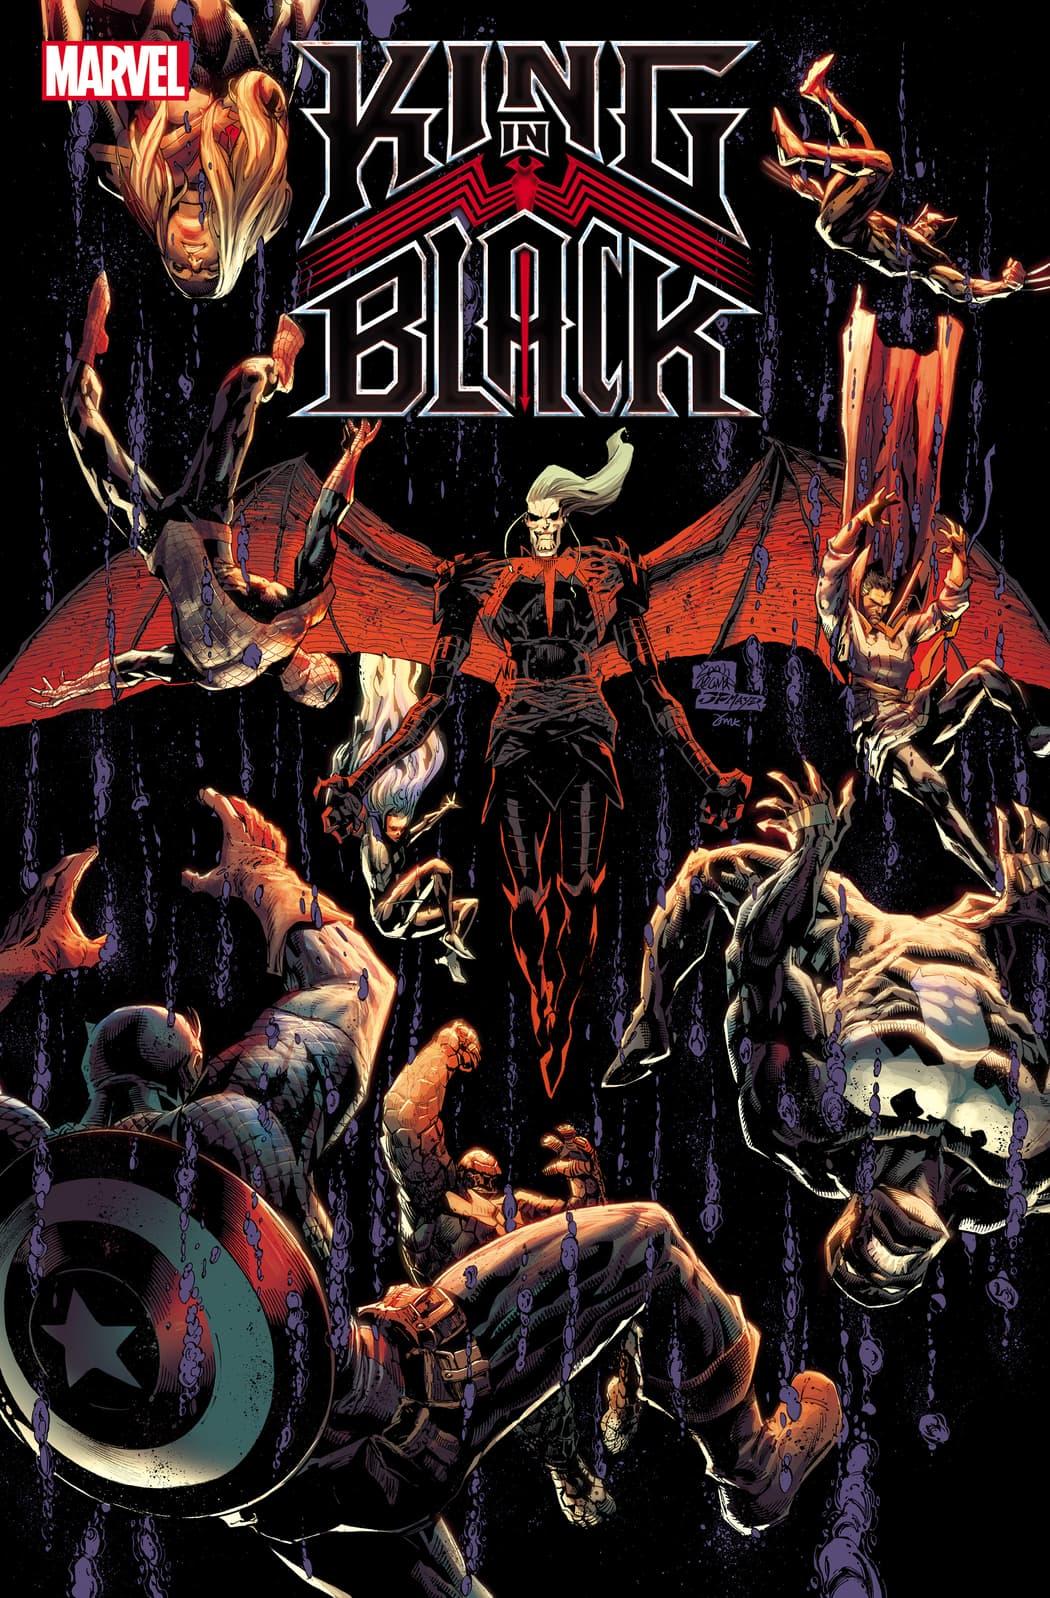 King in Black' Descends Upon the Marvel Universe This December   Marvel